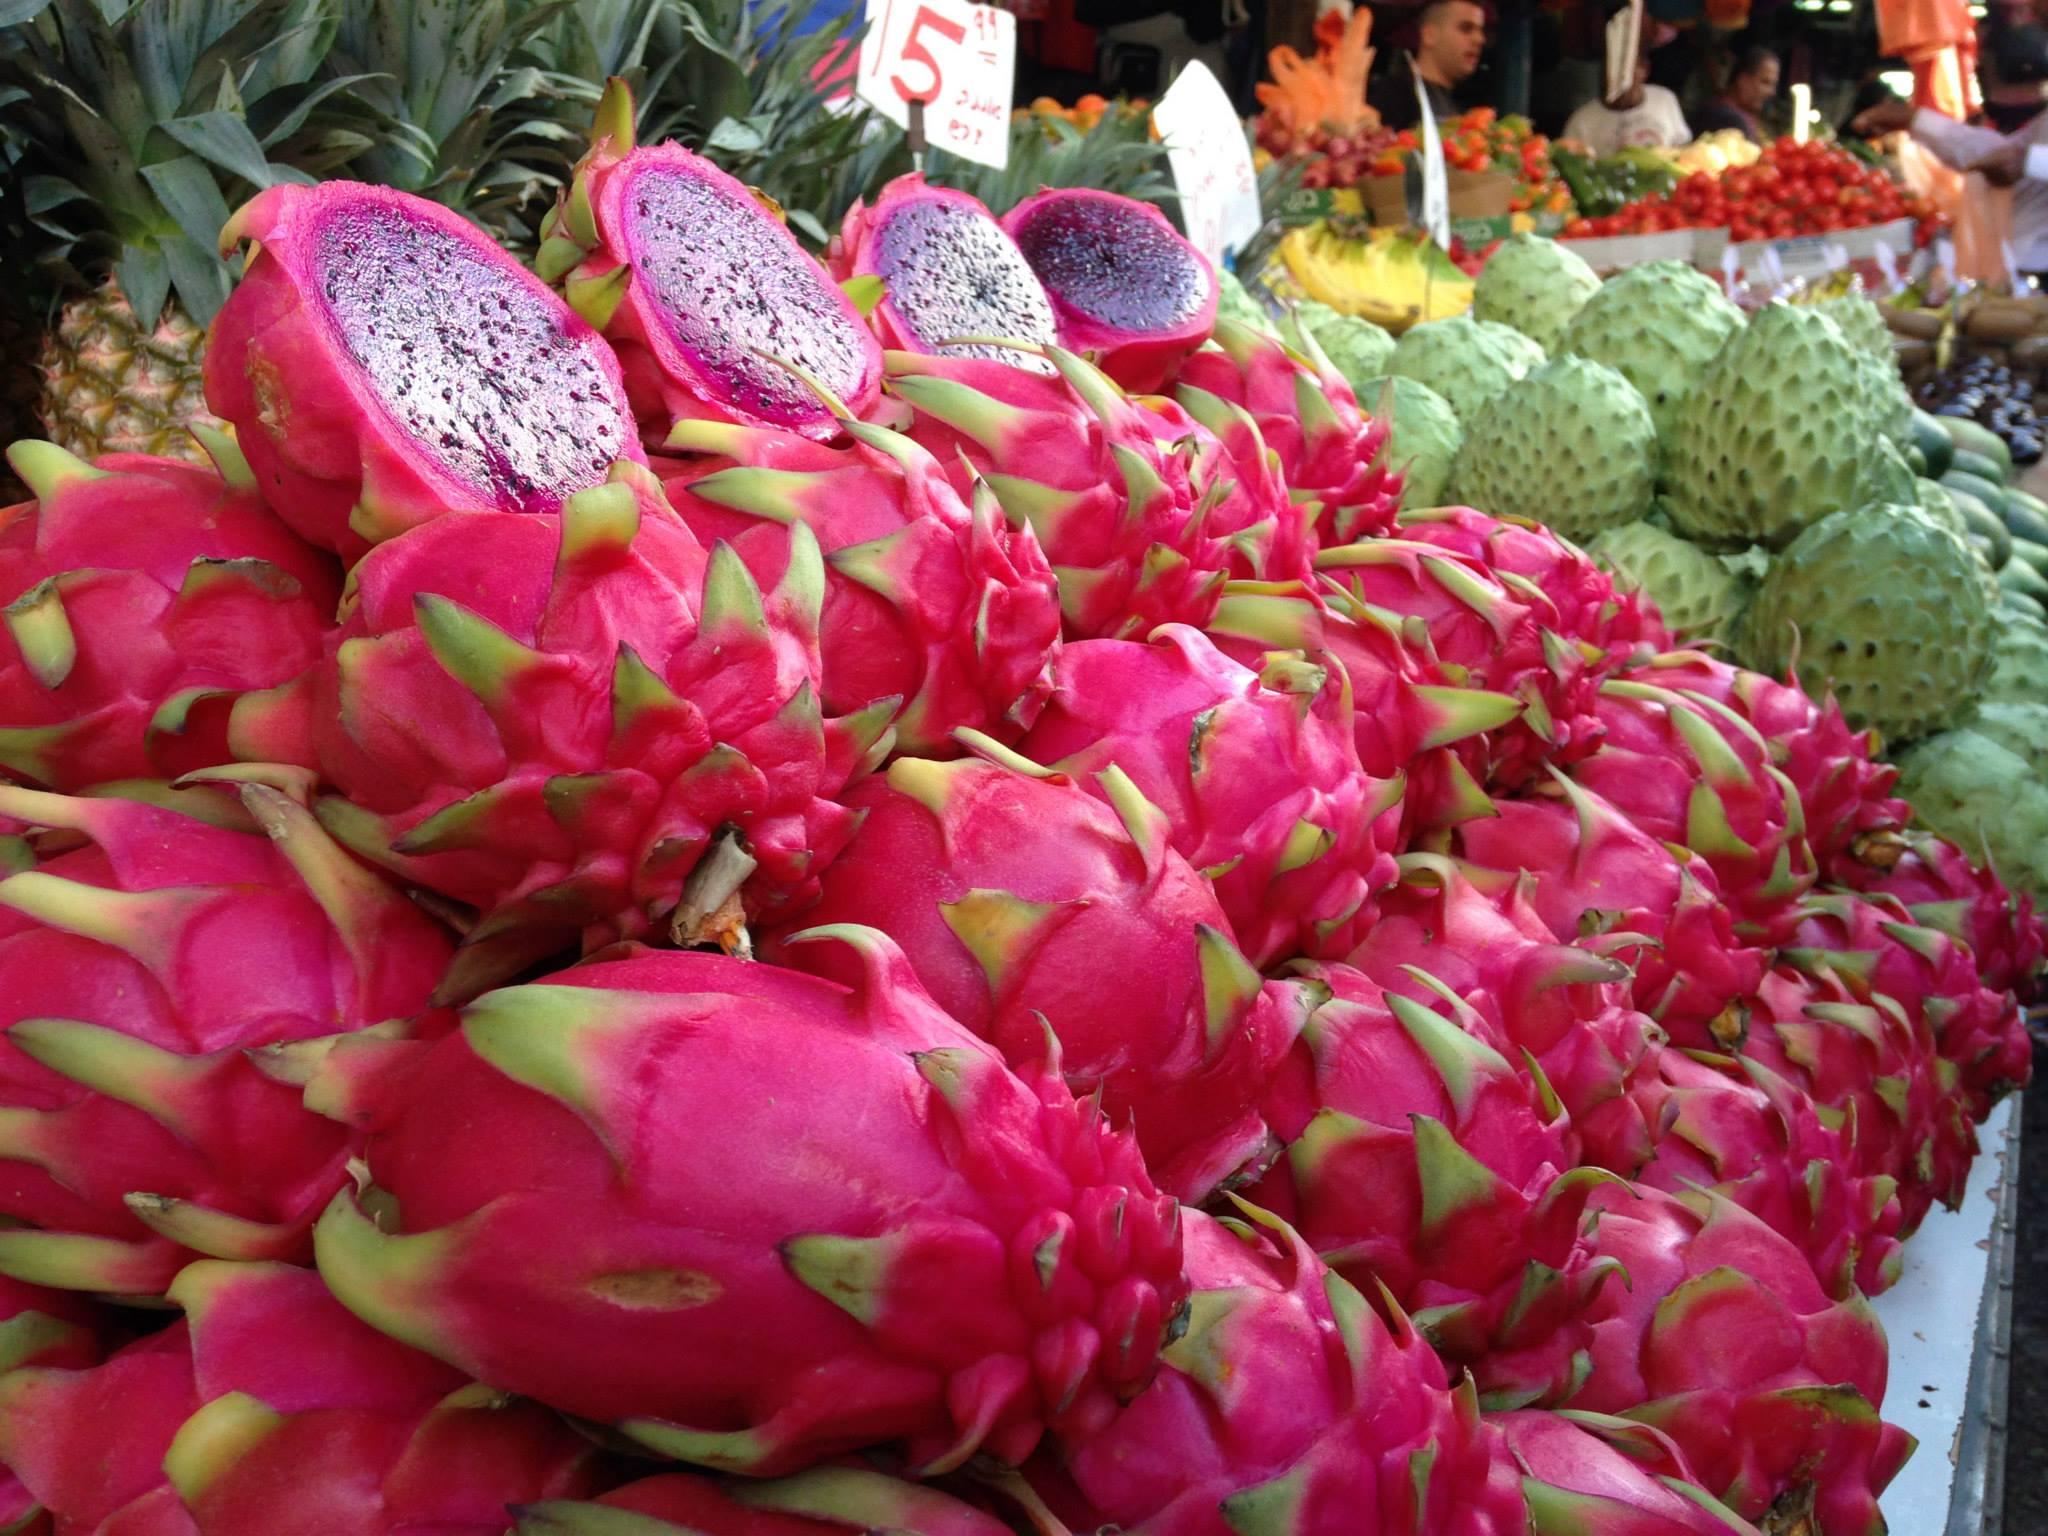 Pitaya-vruchten op een markt in Jeruzalem